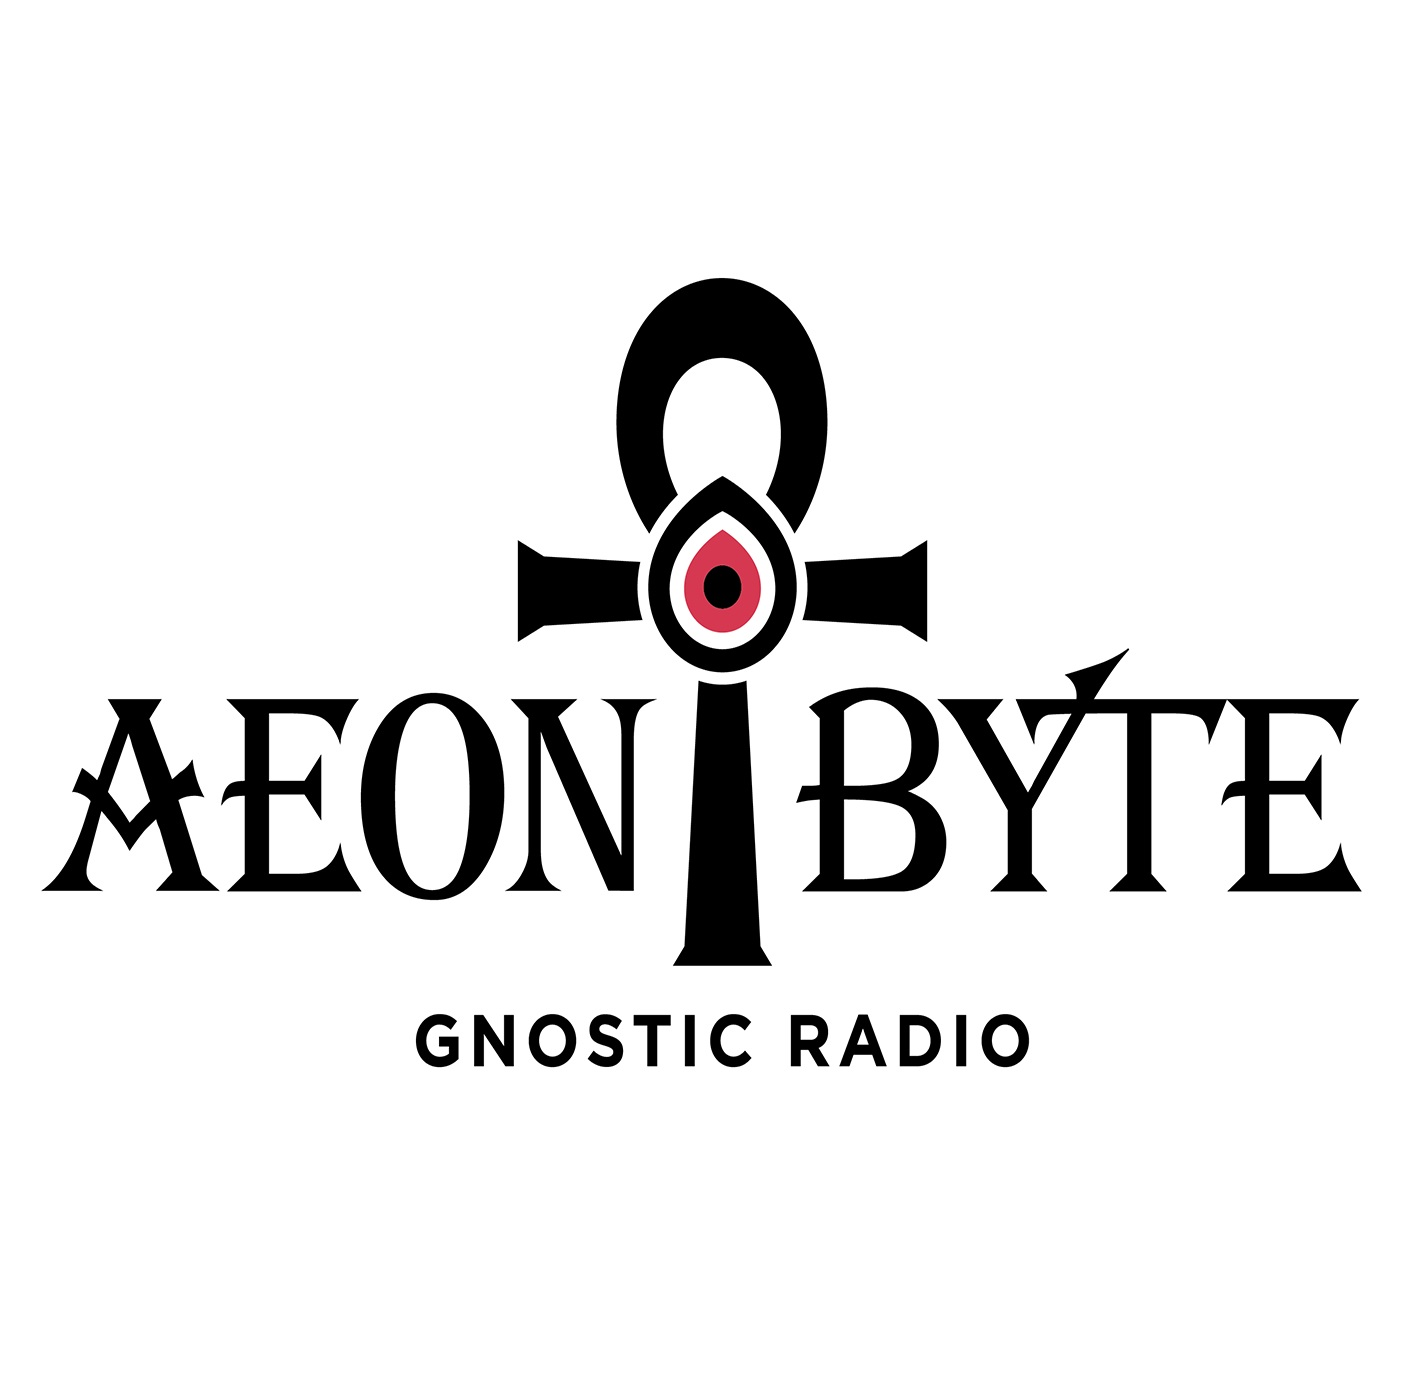 Aeon Byte Gnostic Radio (podcast)